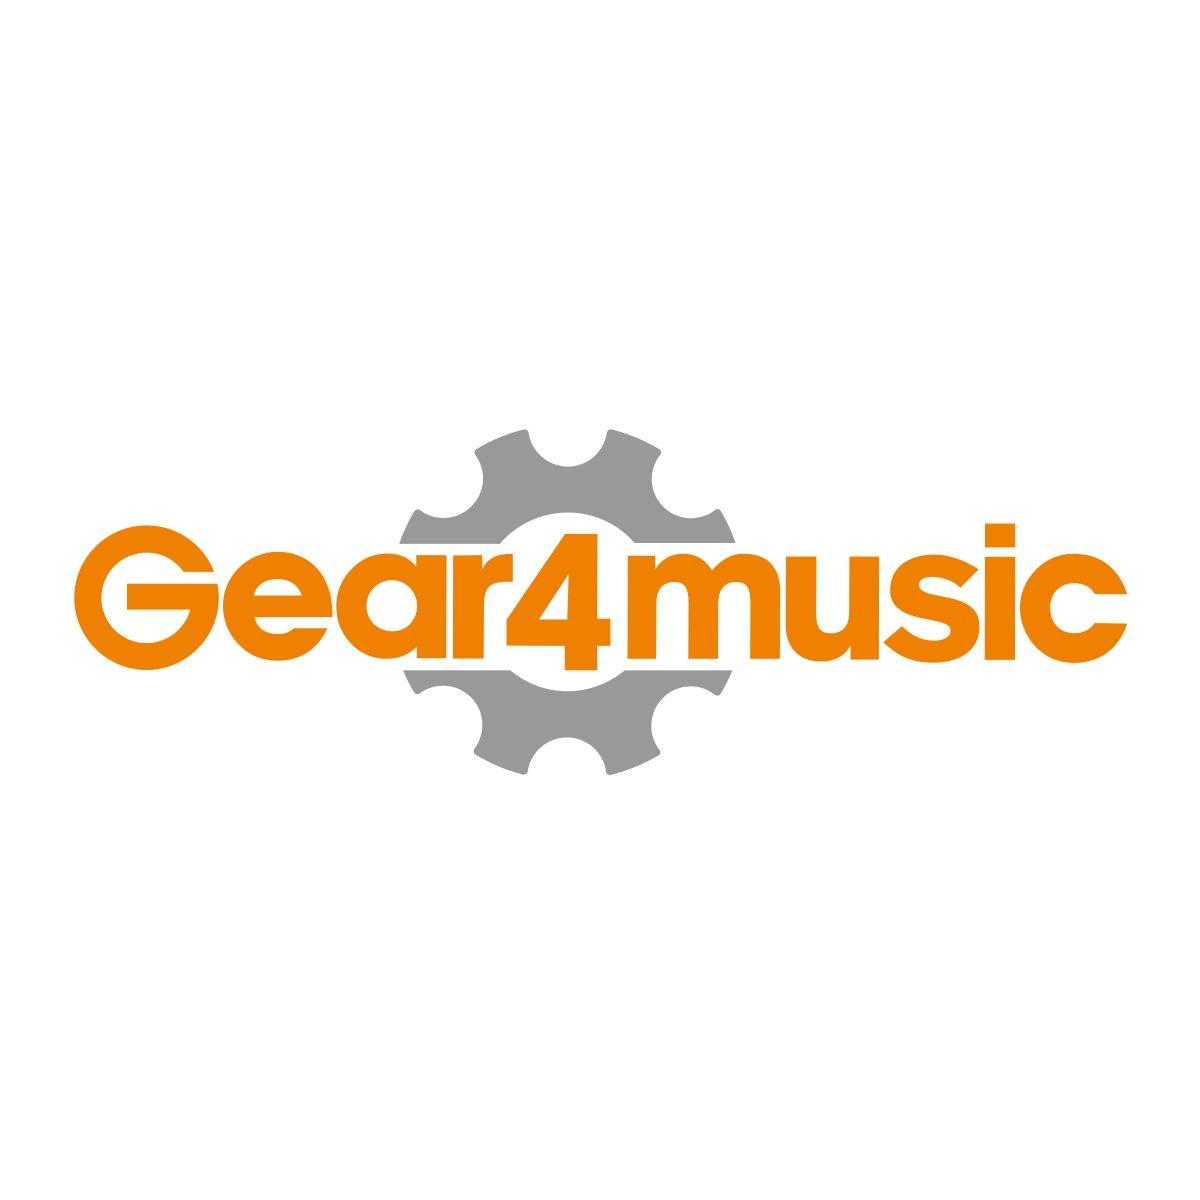 MK-2000 54-key Portable Keyboard by Gear4music - Starter Pack